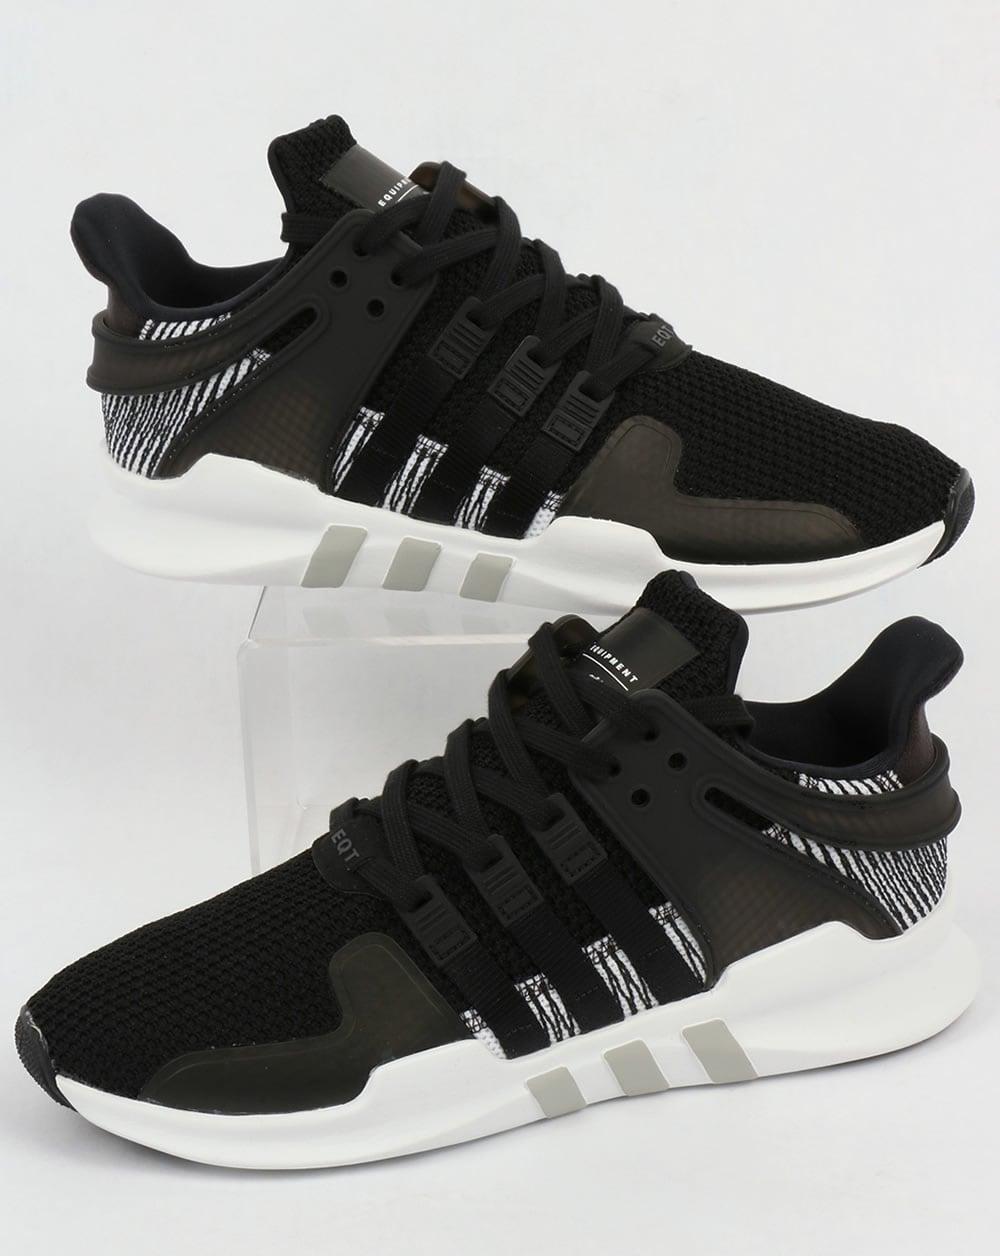 Adidas EQT Support Adv Trainers Black White